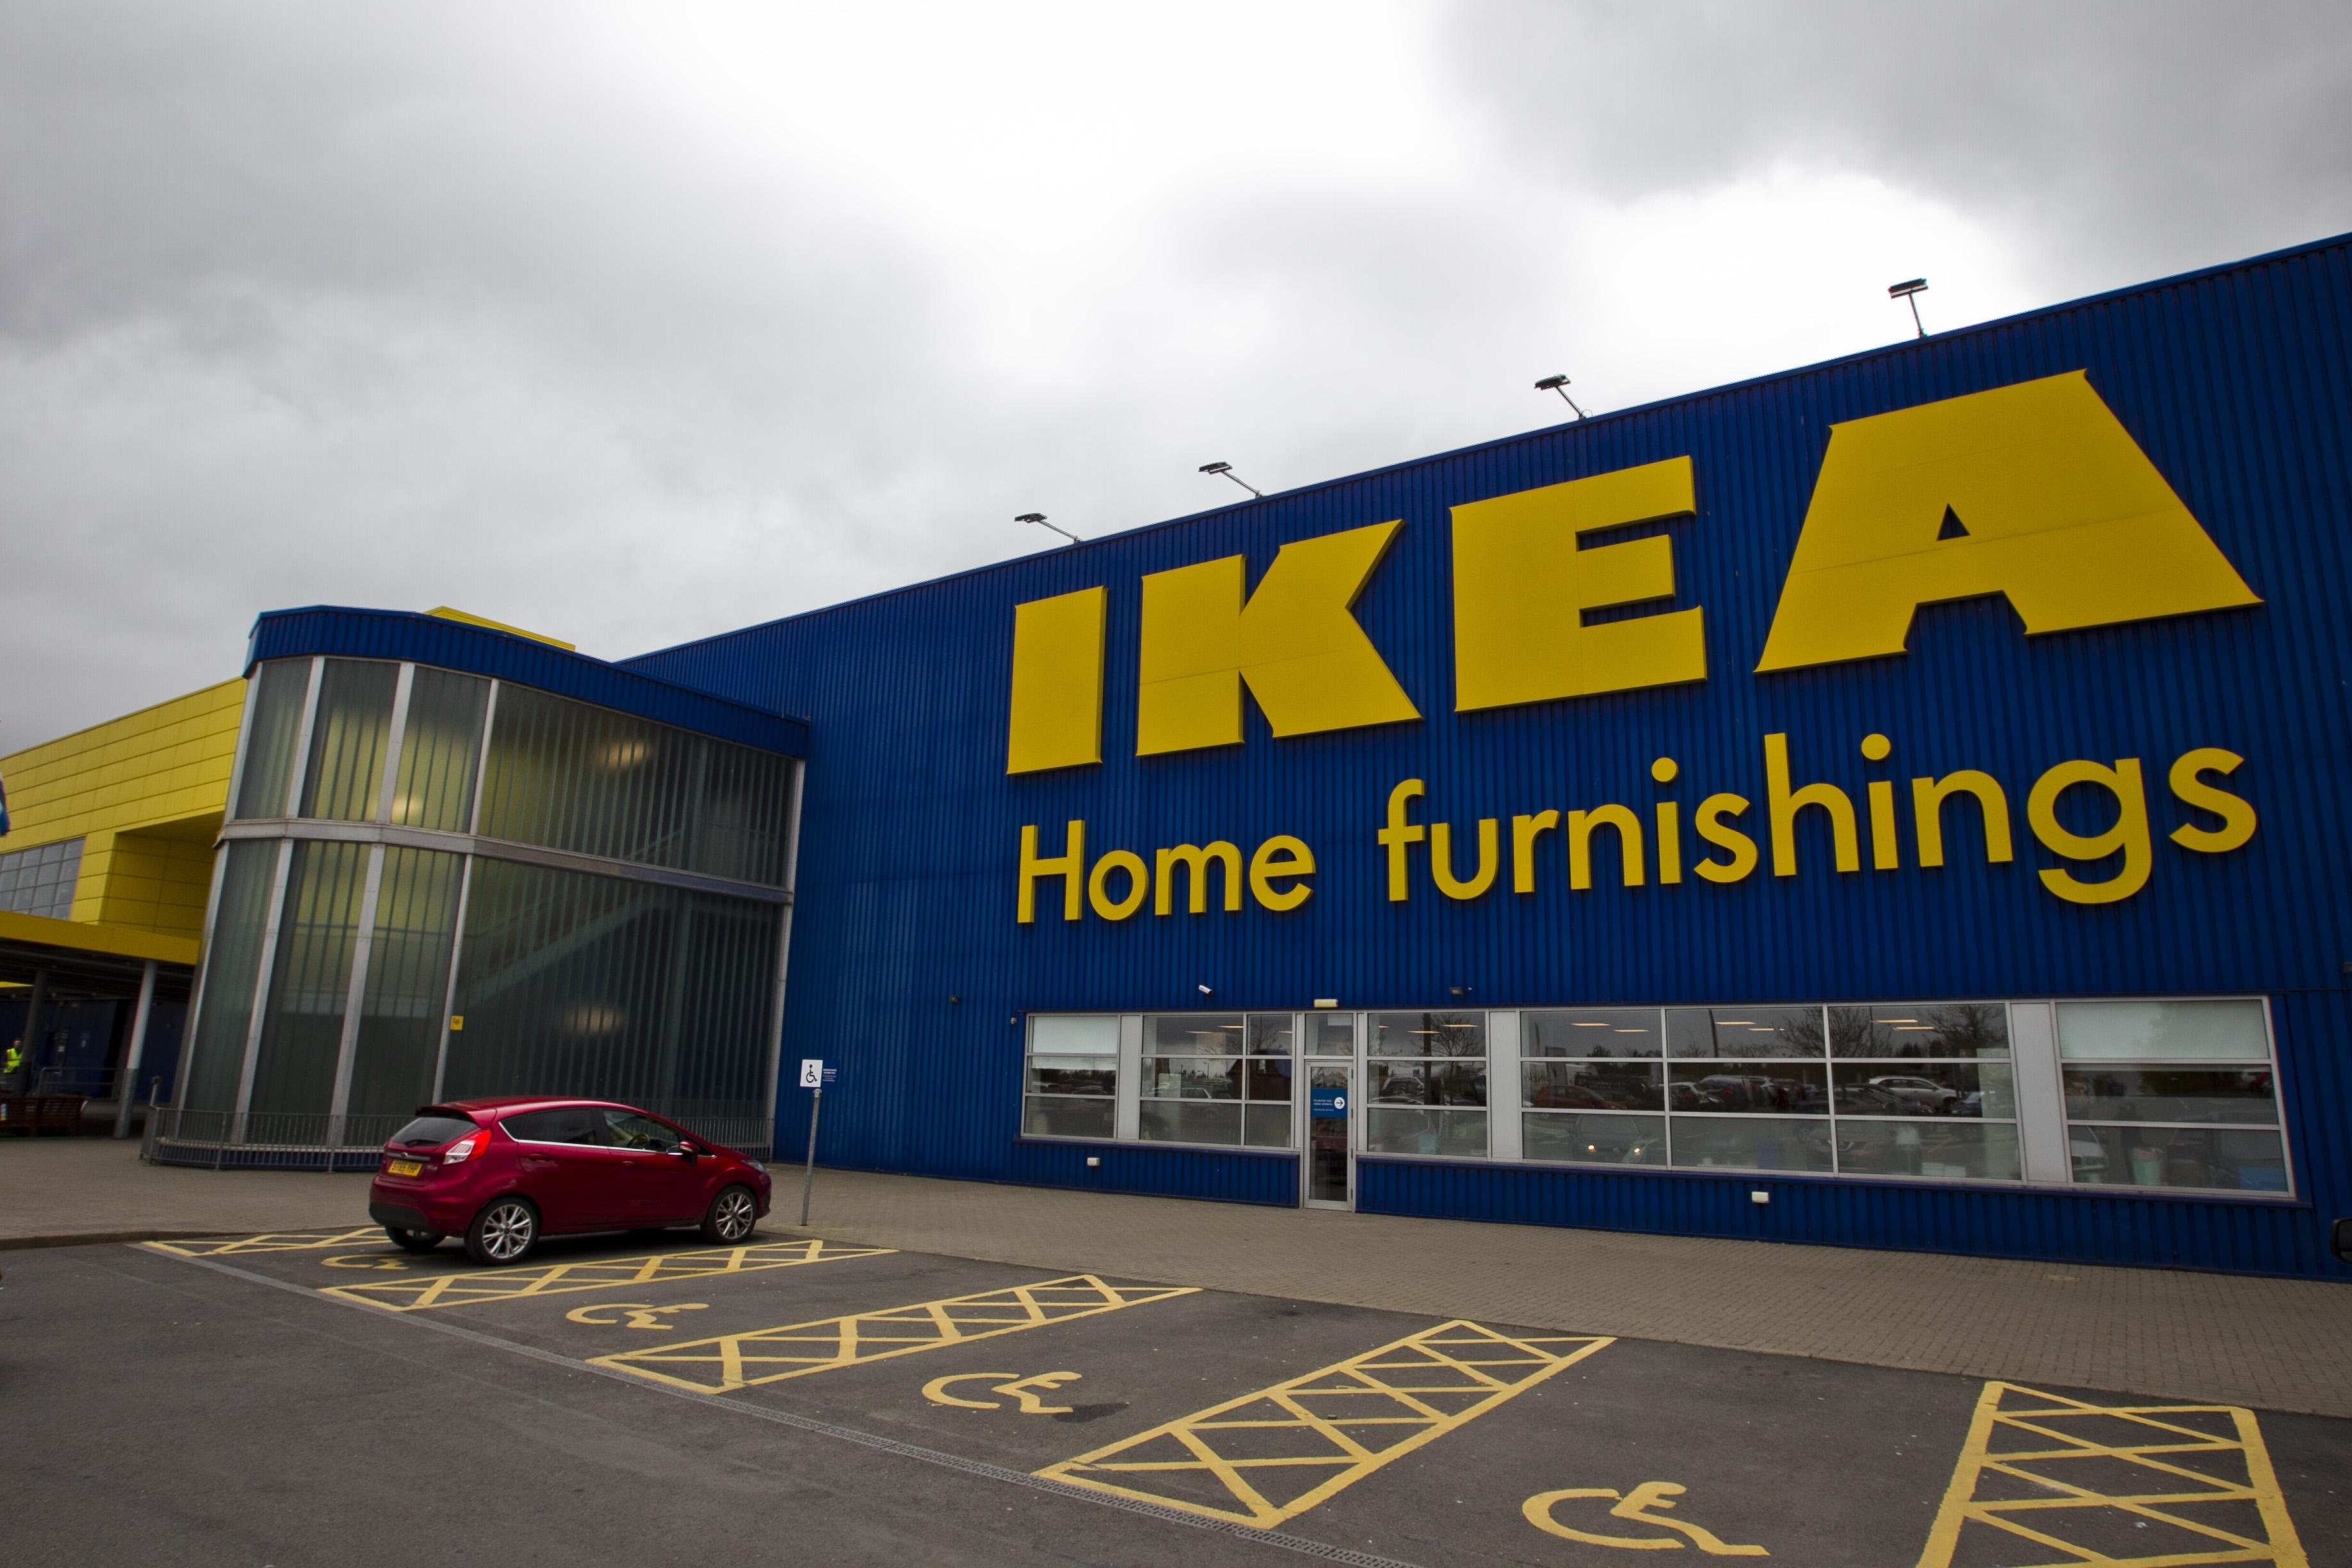 Ikea in Edinburgh (Andrew Cawley / DC Thomson)